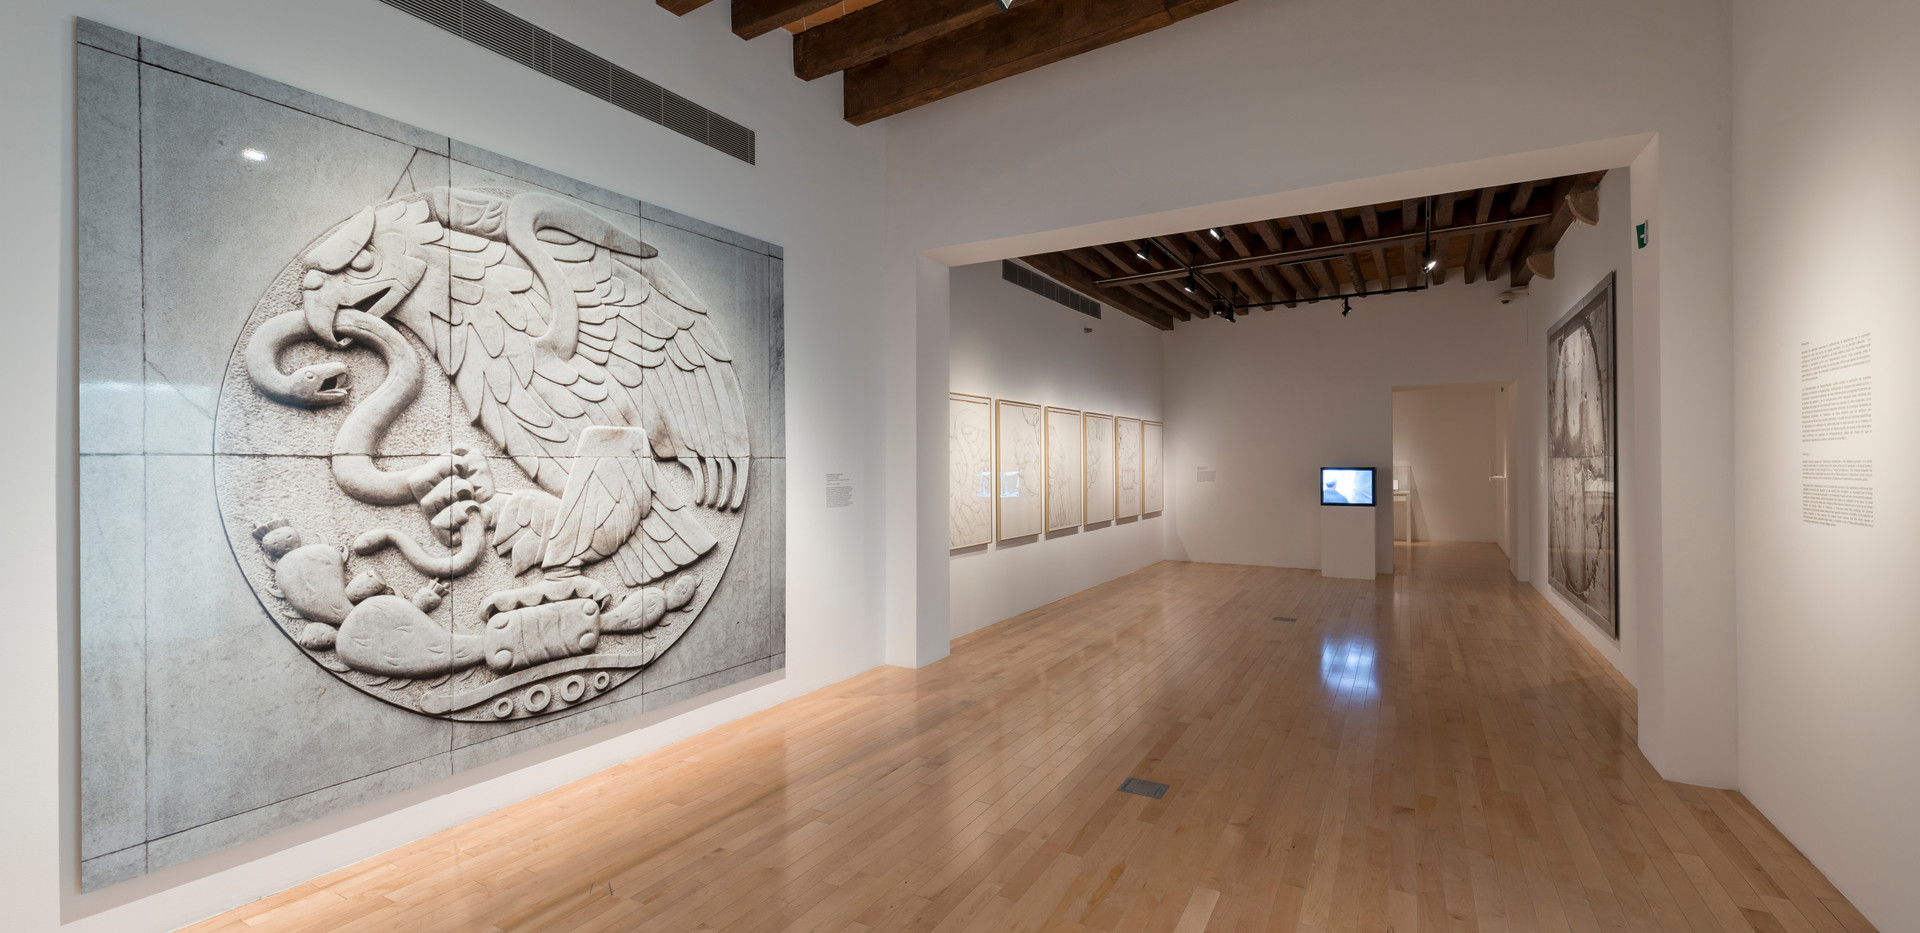 Tercerunquinto @ Museo Amparo, Puebla, Mx.